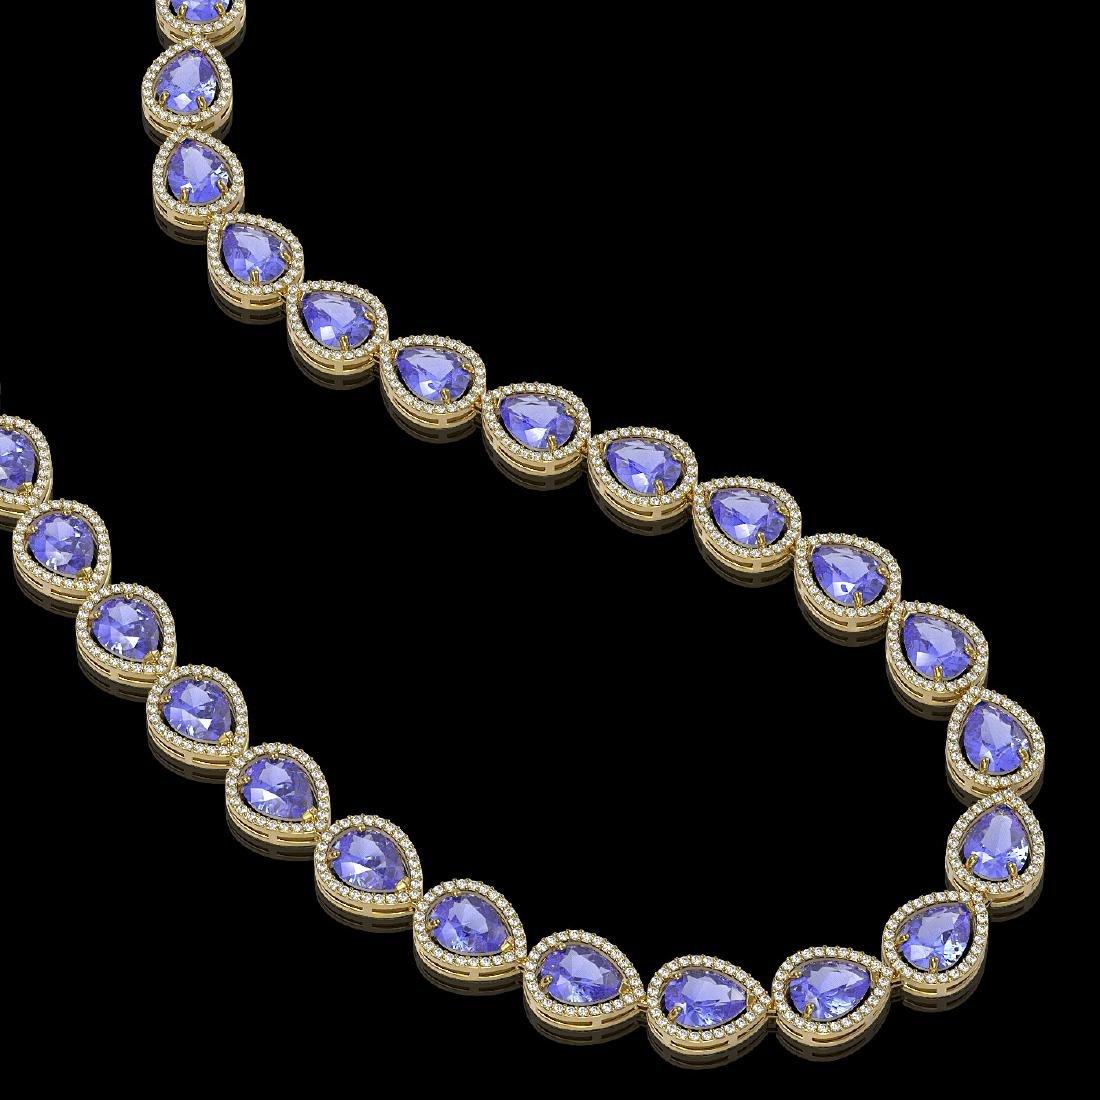 44.8 CTW Tanzanite & Diamond Halo Necklace 10K Yellow - 2